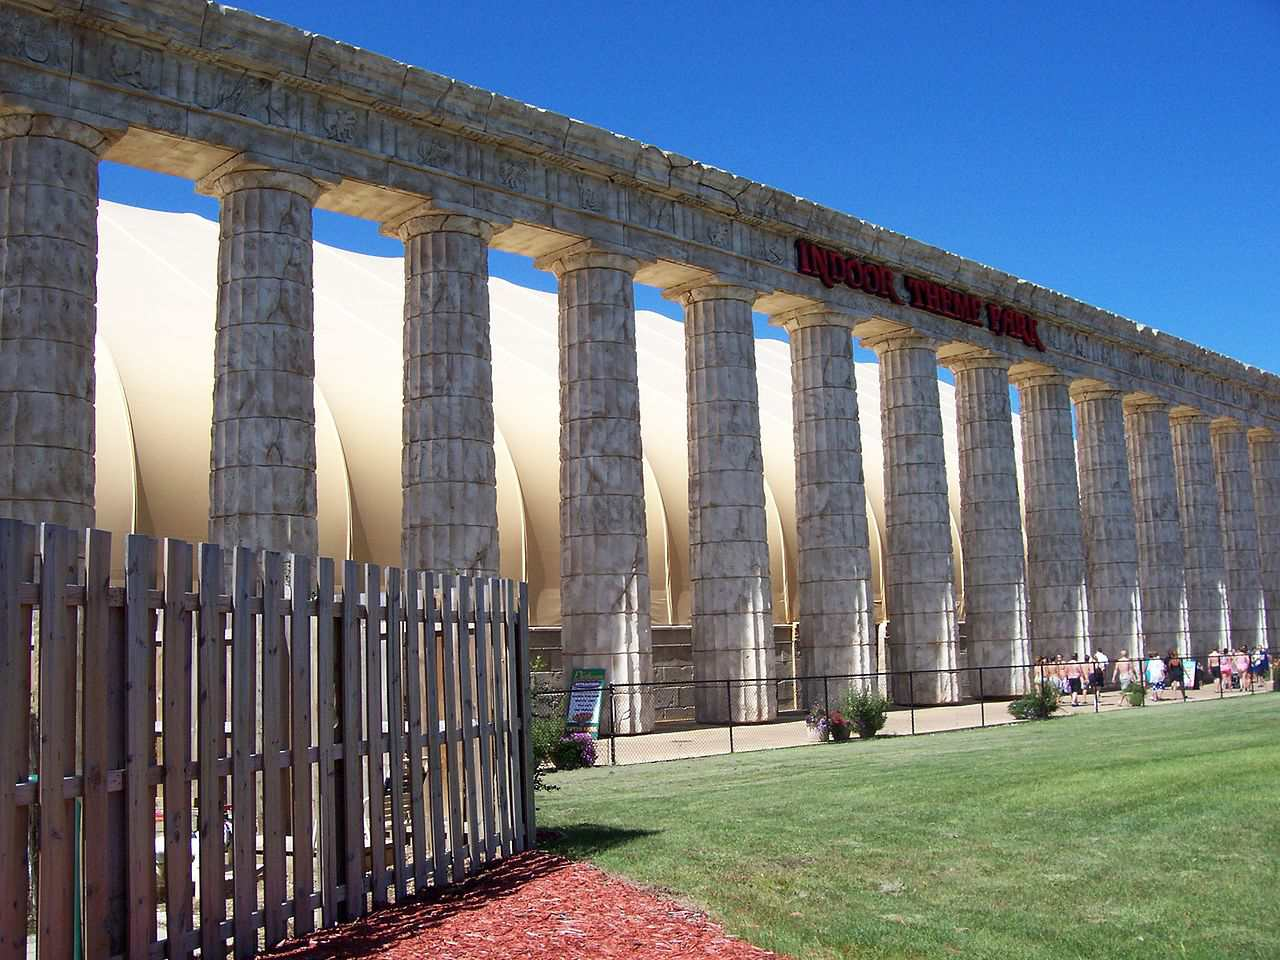 The Parthenon indoor theme park